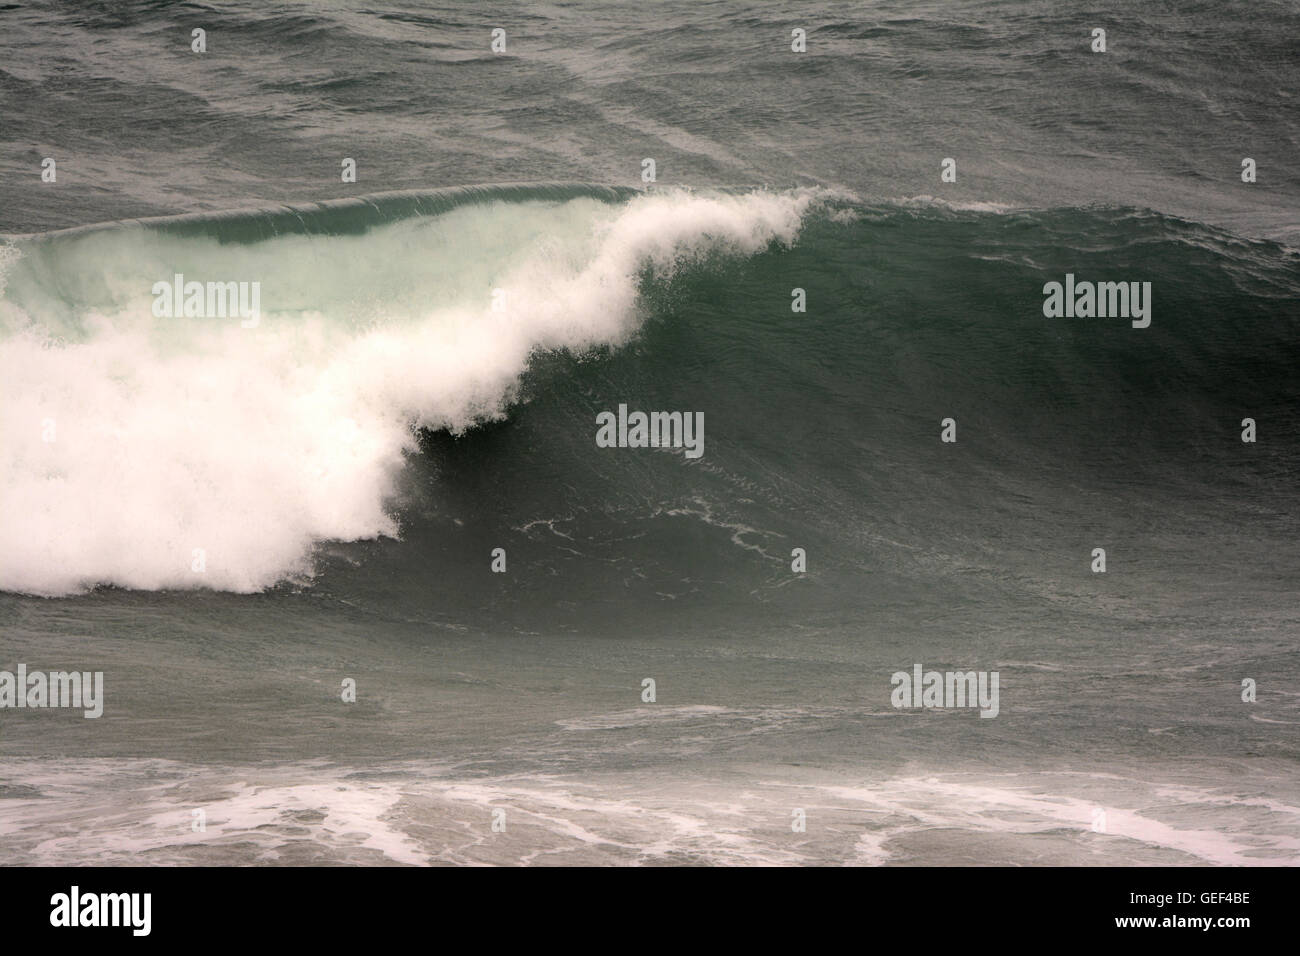 Rompiendo olas Imagen De Stock